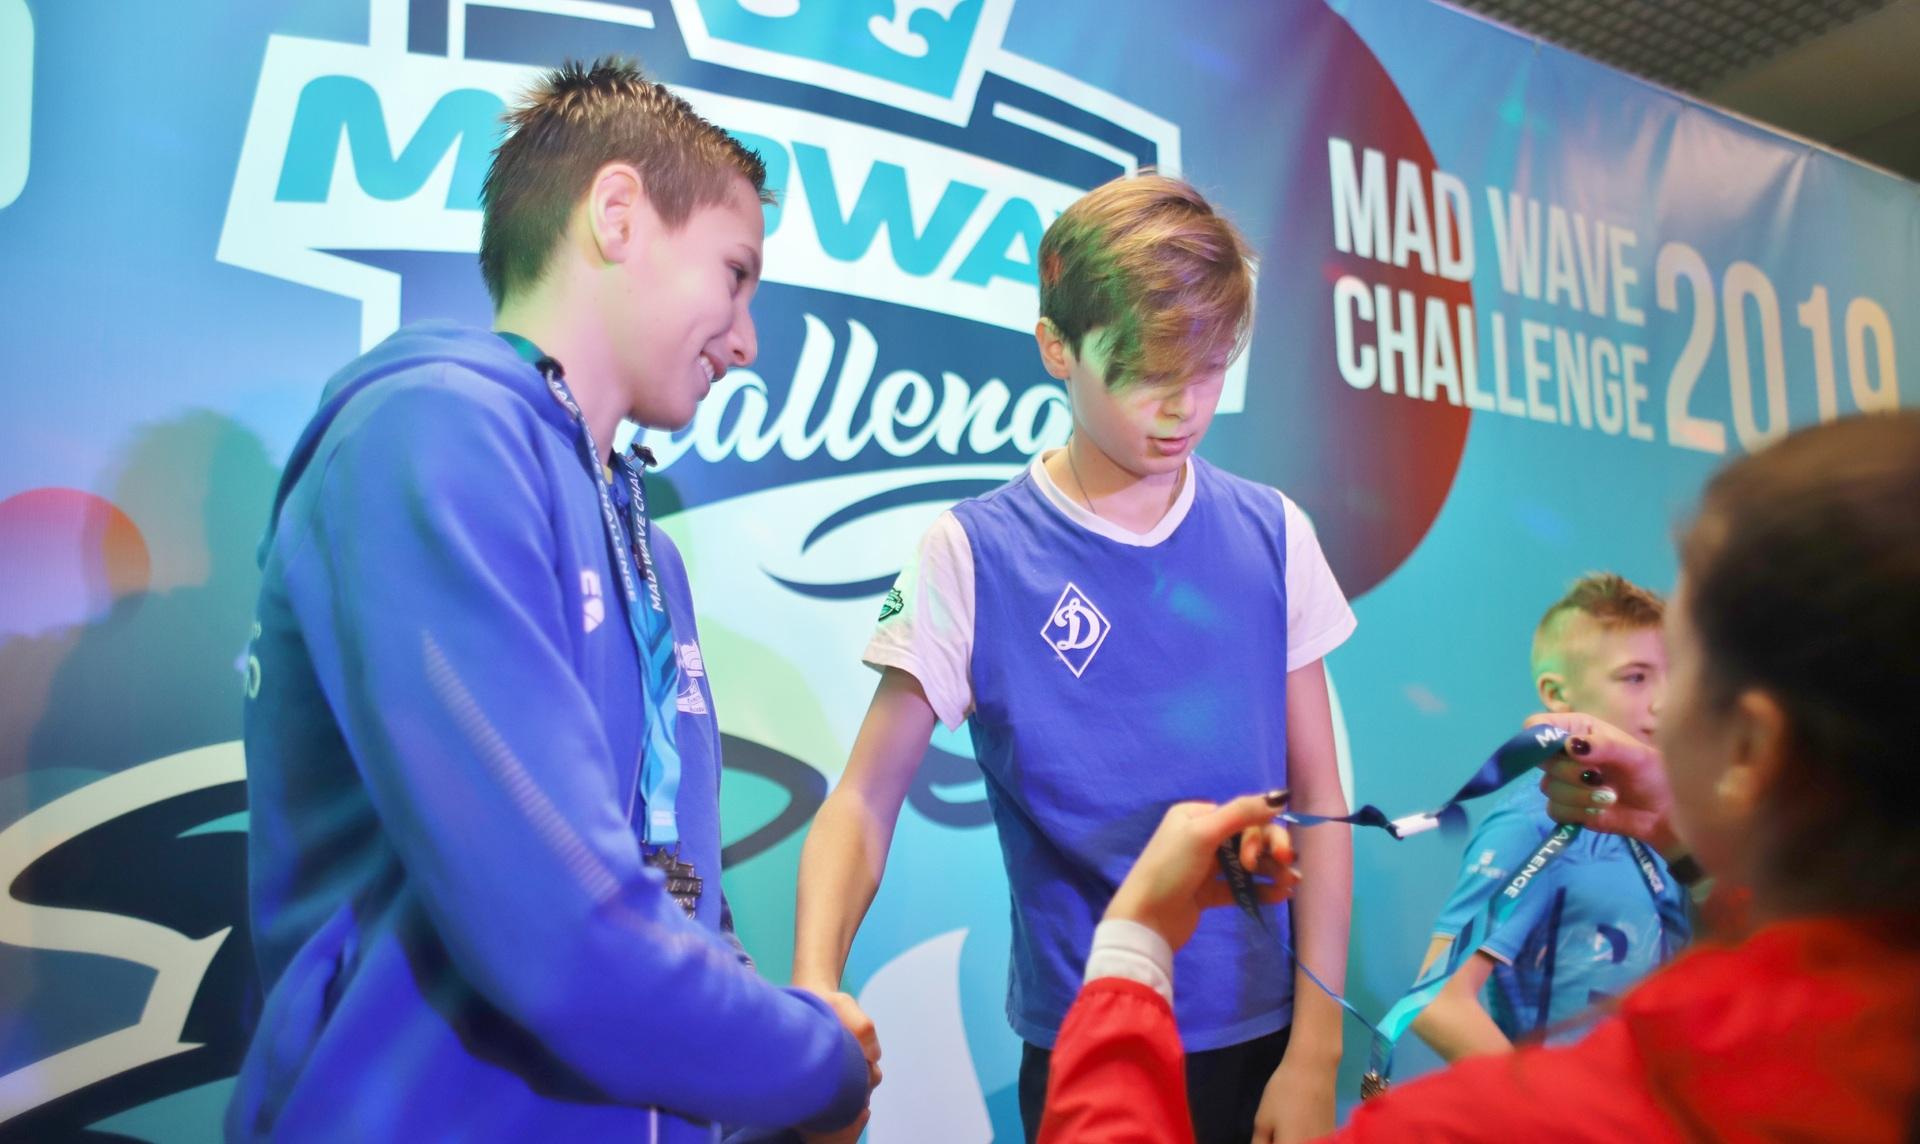 I этап «Mad Wave Challenge 2019» в Бресте